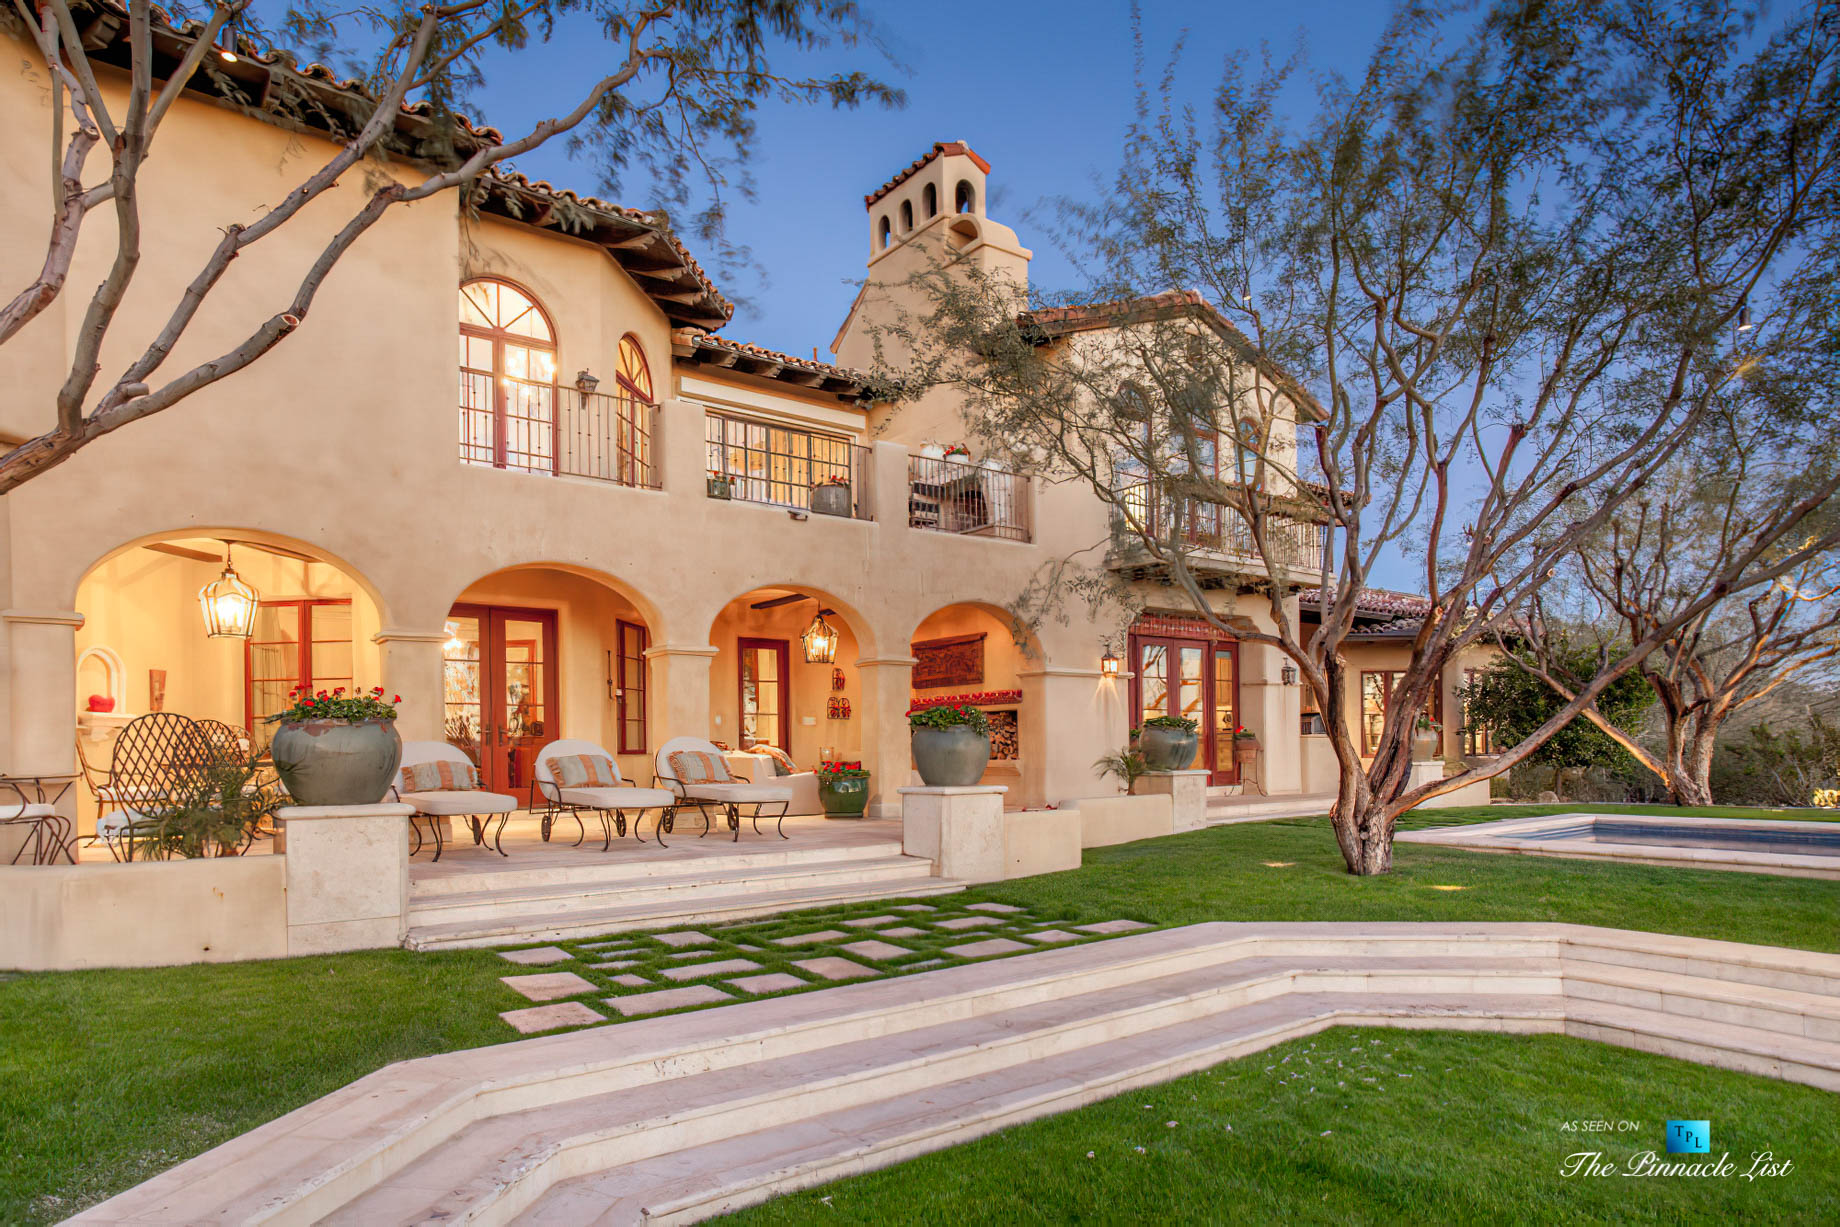 6539 N 31st Pl, Phoenix, AZ, USA - Back Yard Deck - Luxury Real Estate - Biltmore Mountain Estates - Spanish Colonial Home